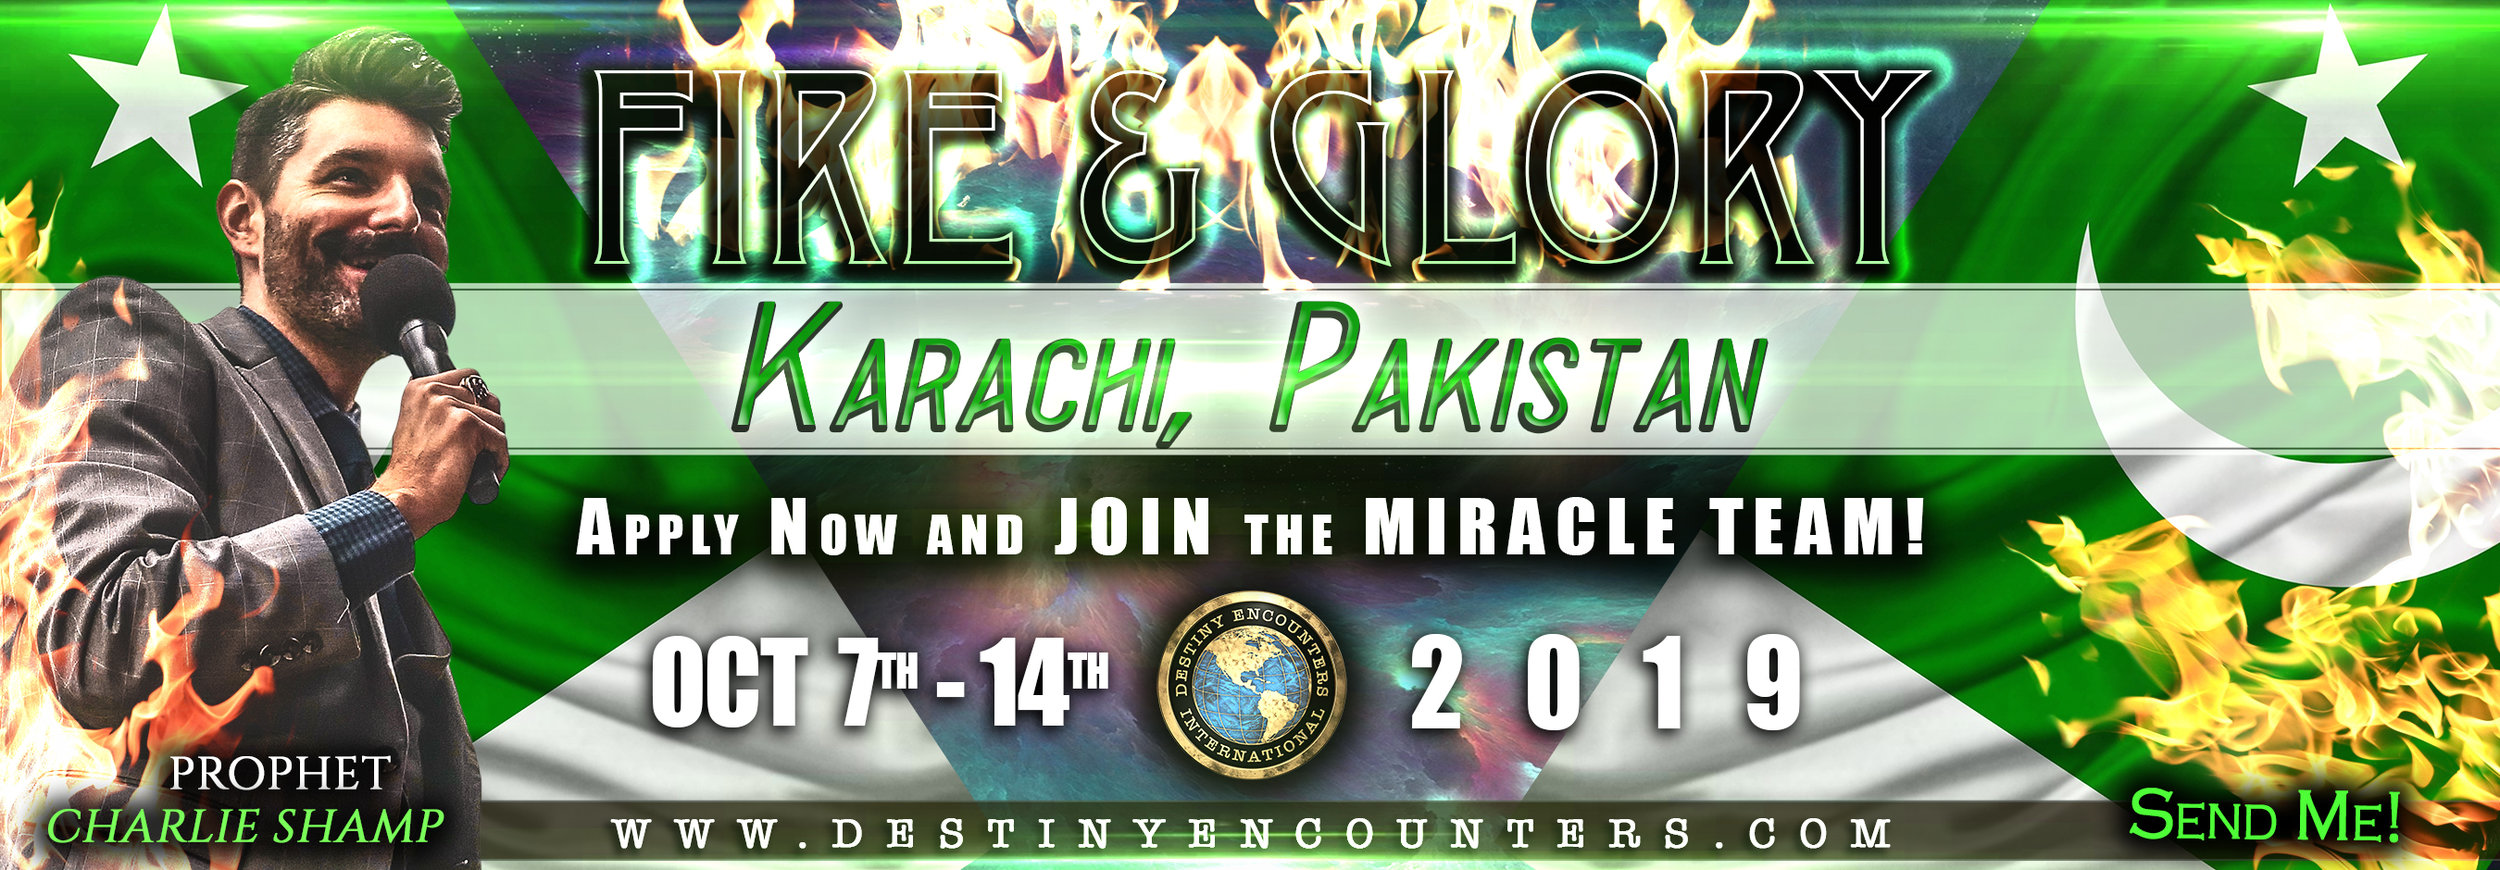 Karachi Pakistan Team 2019  Banner.jpg